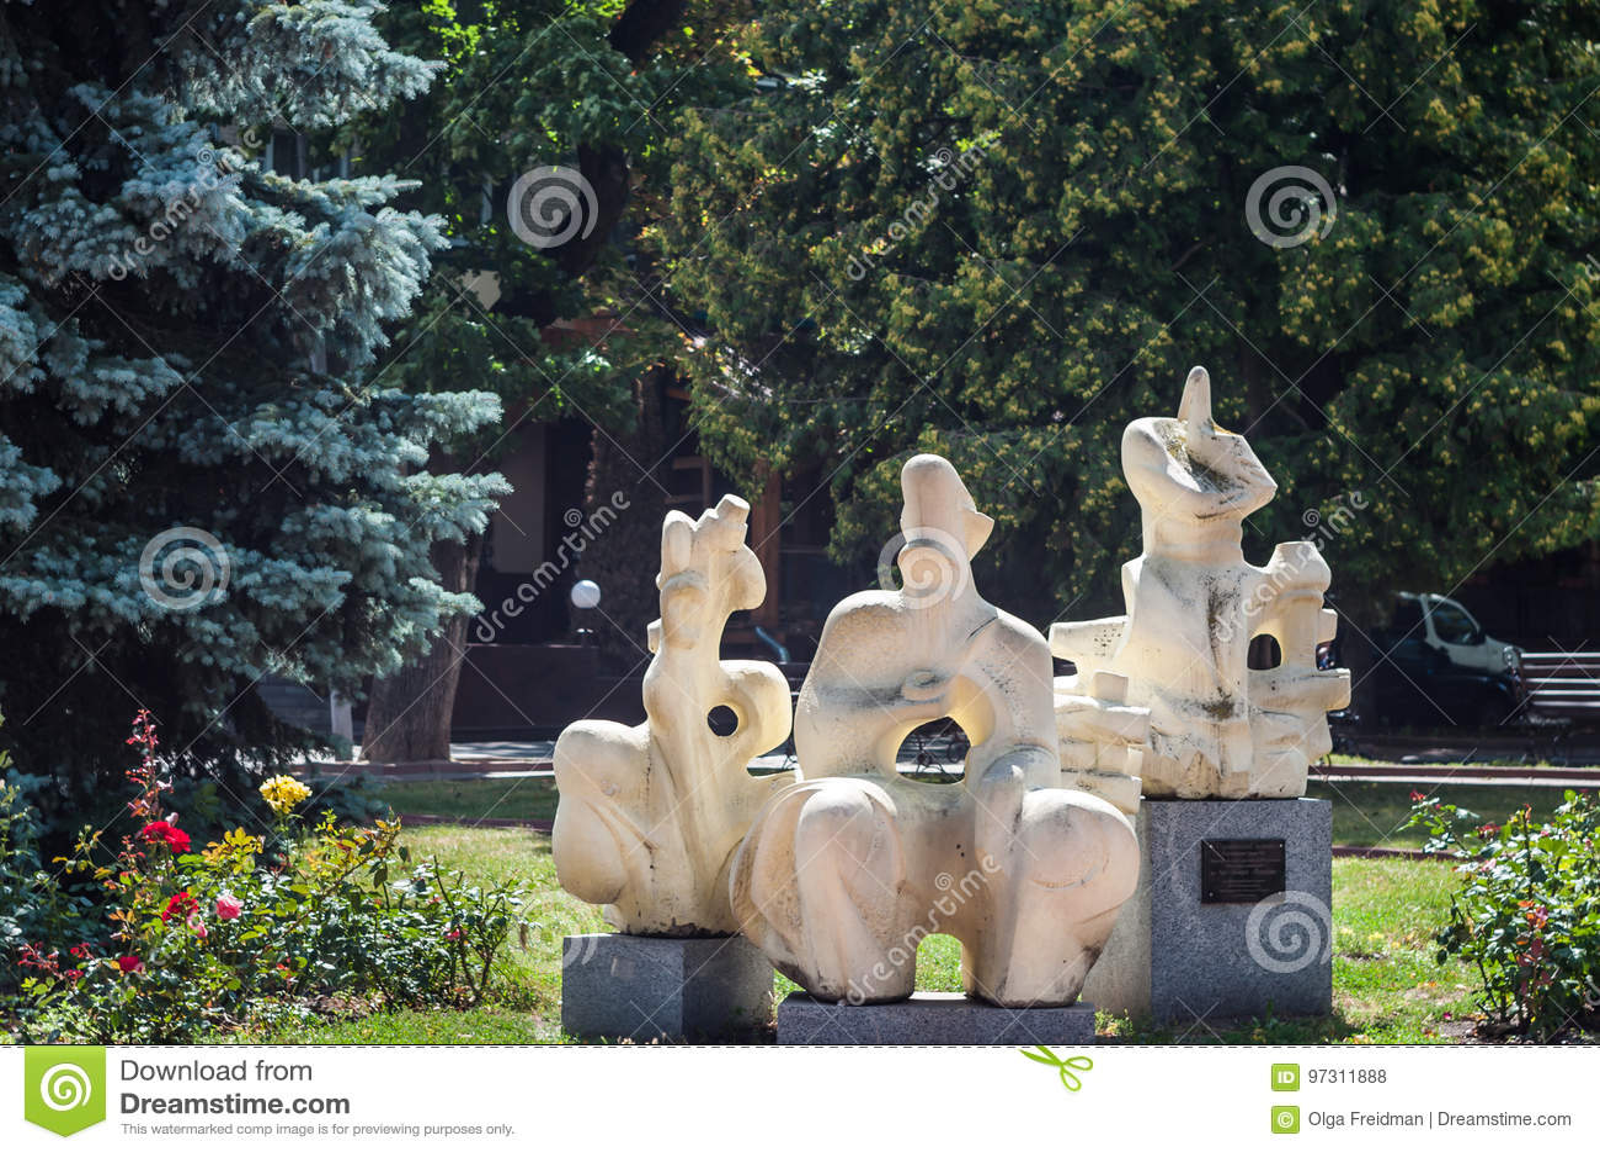 KHMELNITSKY UKRAINA - JULI 29, 2017: Ukrainsk bevekelsegrund, skulptör